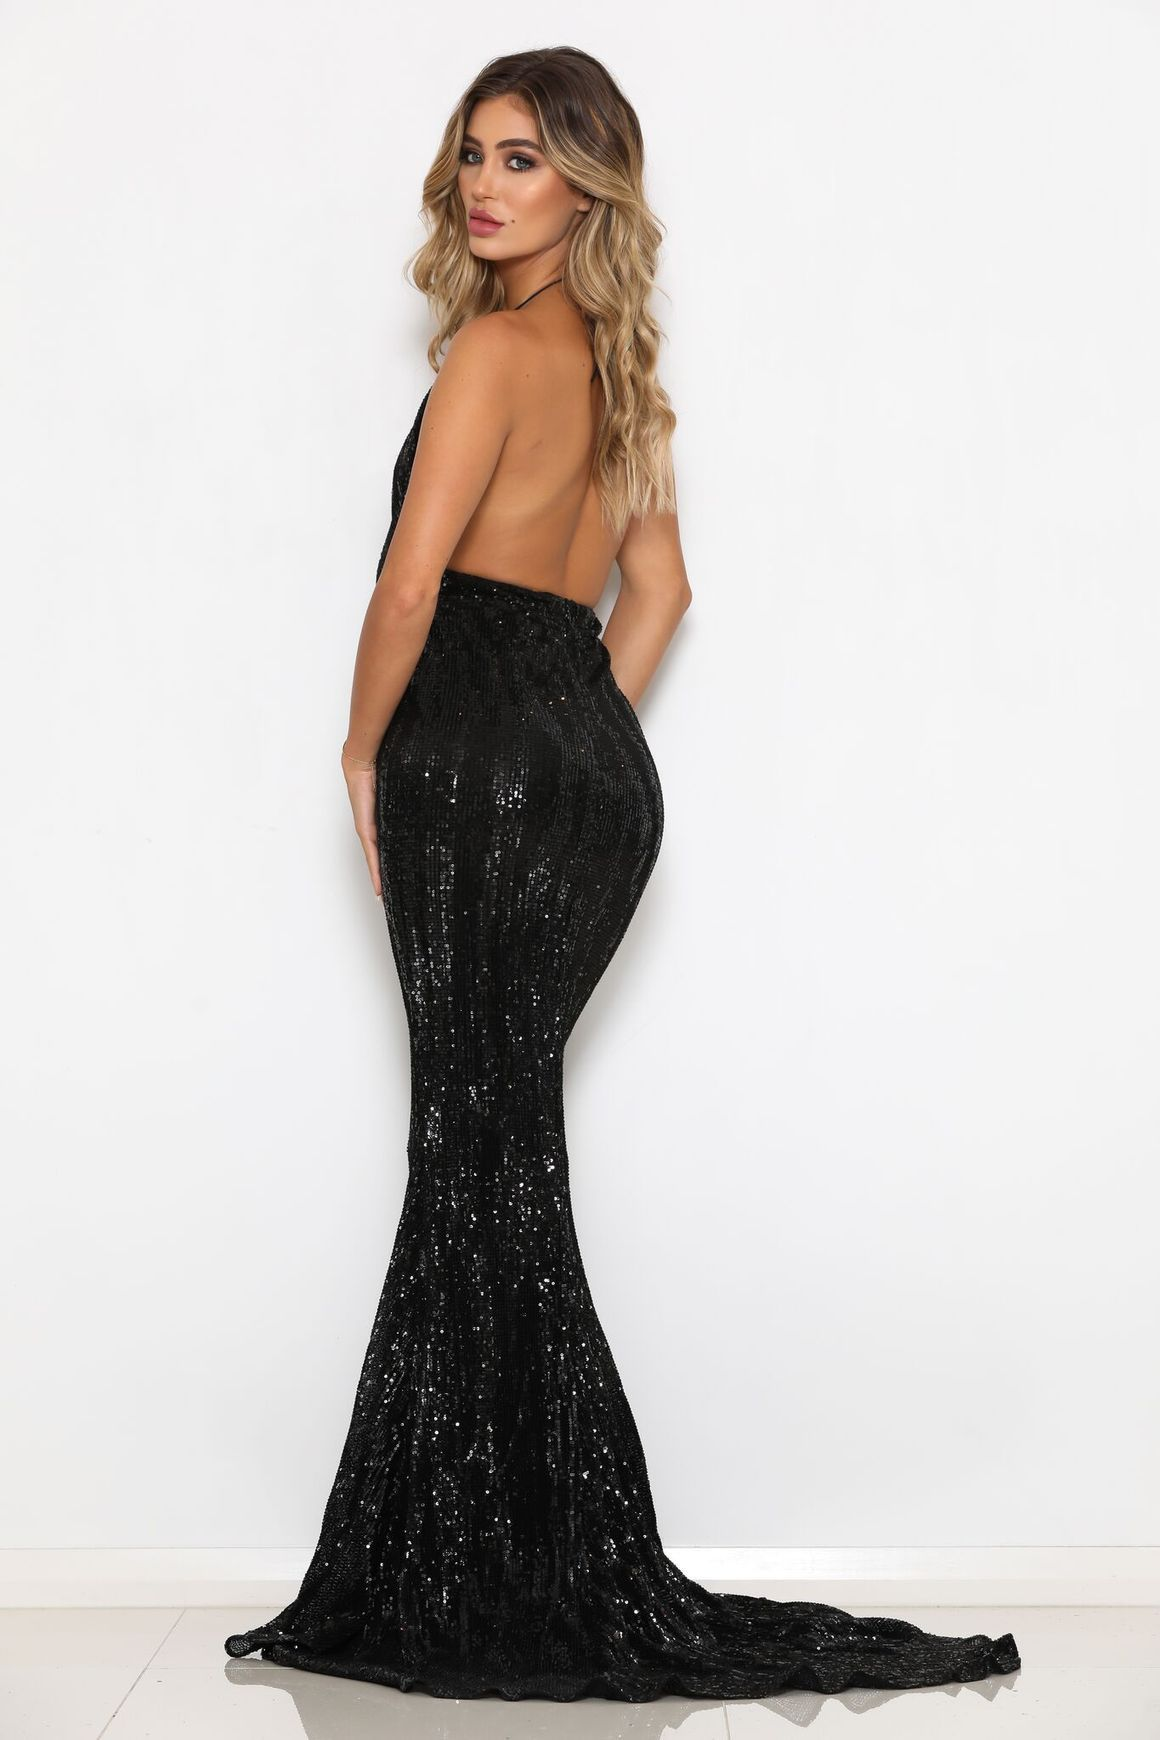 912bddab588 Formal Dresses Boutique Nz - Gomes Weine AG